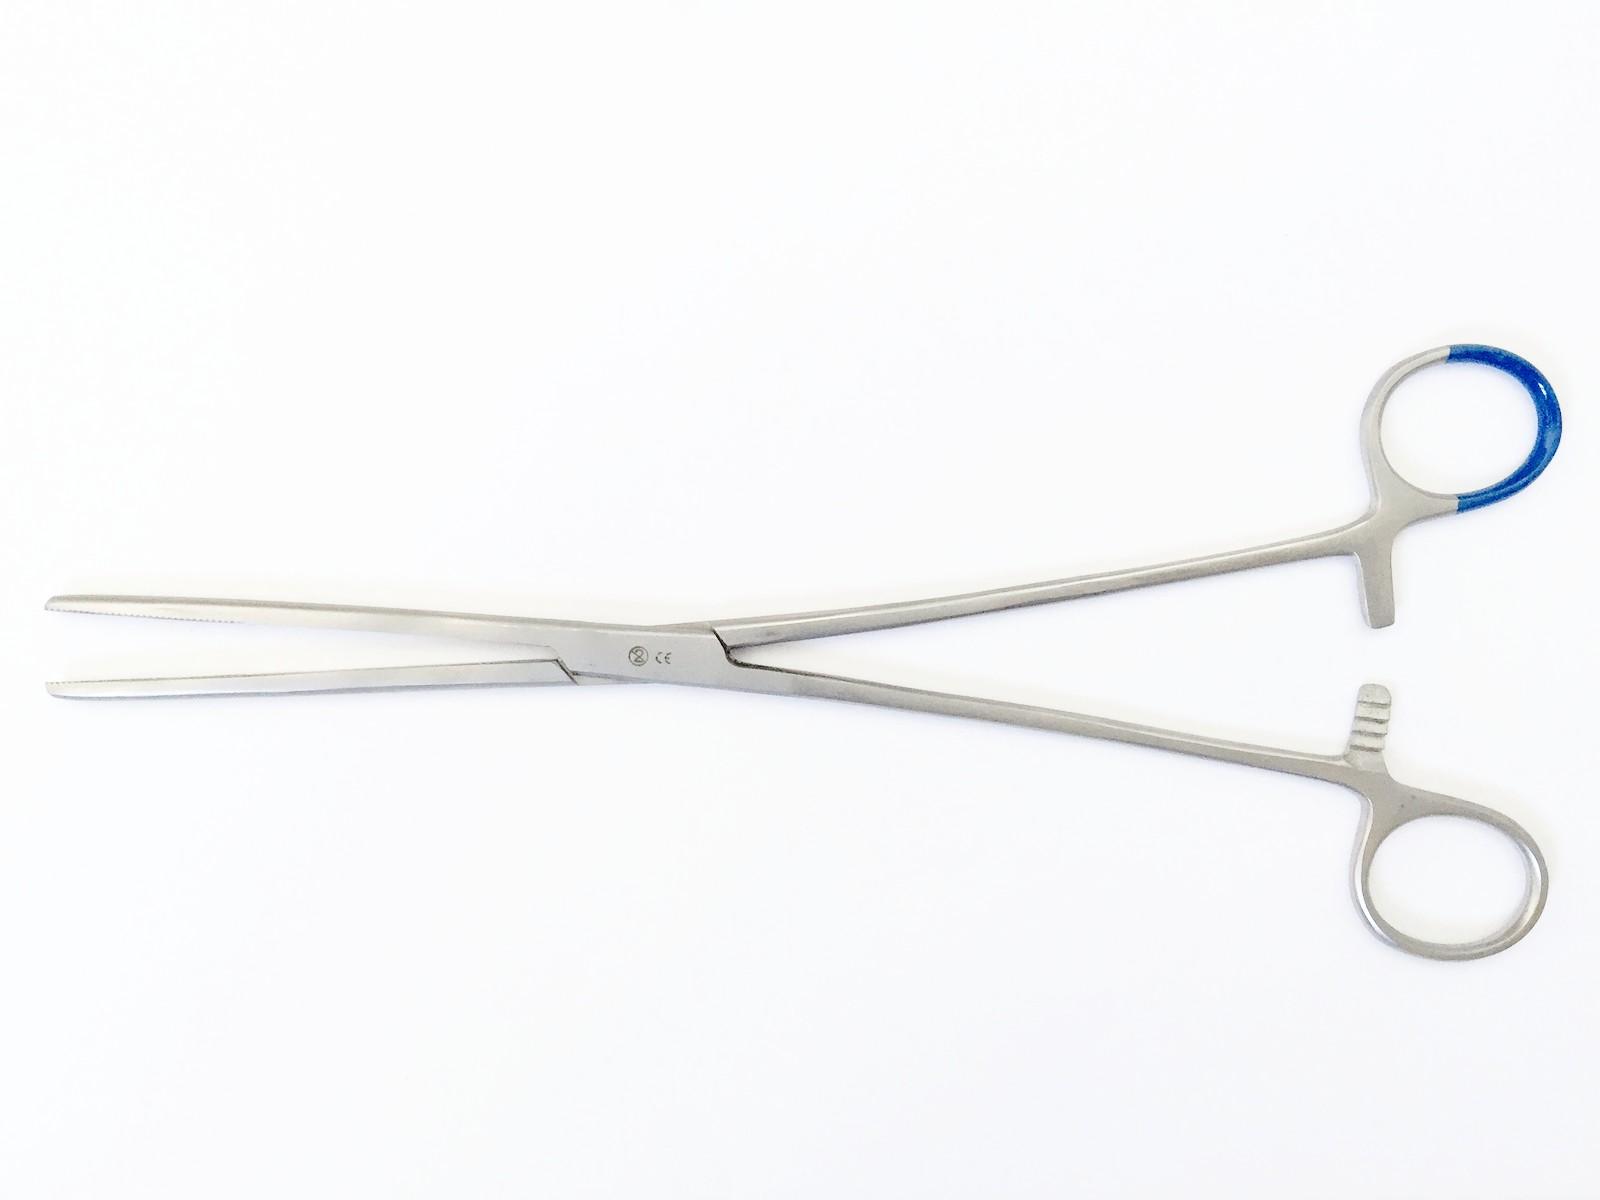 Disposable  Bozemann  tampontang 26cm  LM051508